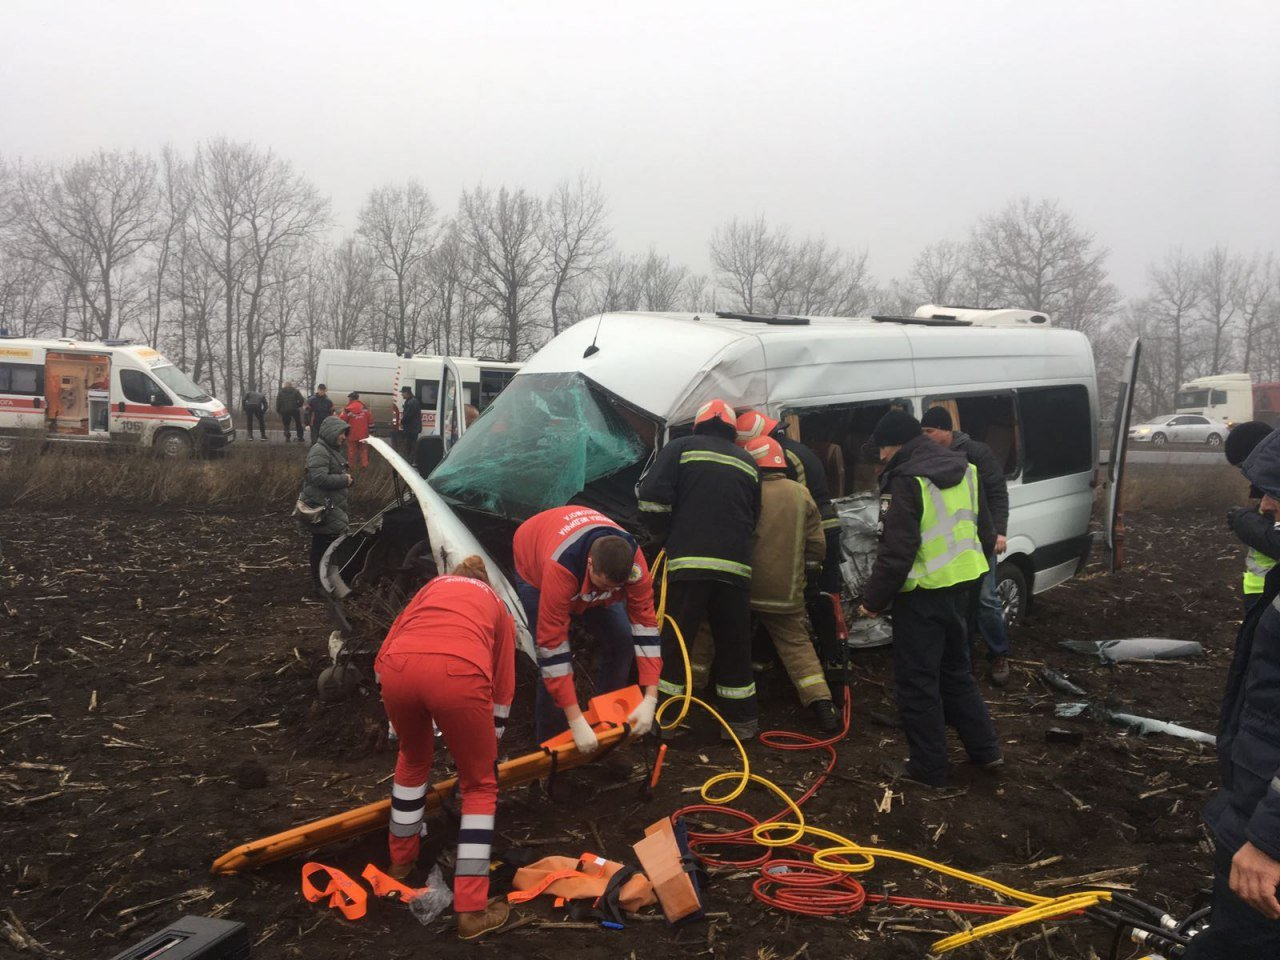 ДТП на трассе Киев-Одесса: столкнулись микроавтобус и грузовик, есть пострадавшие, - ФОТО, фото-1, Фото ГСЧС